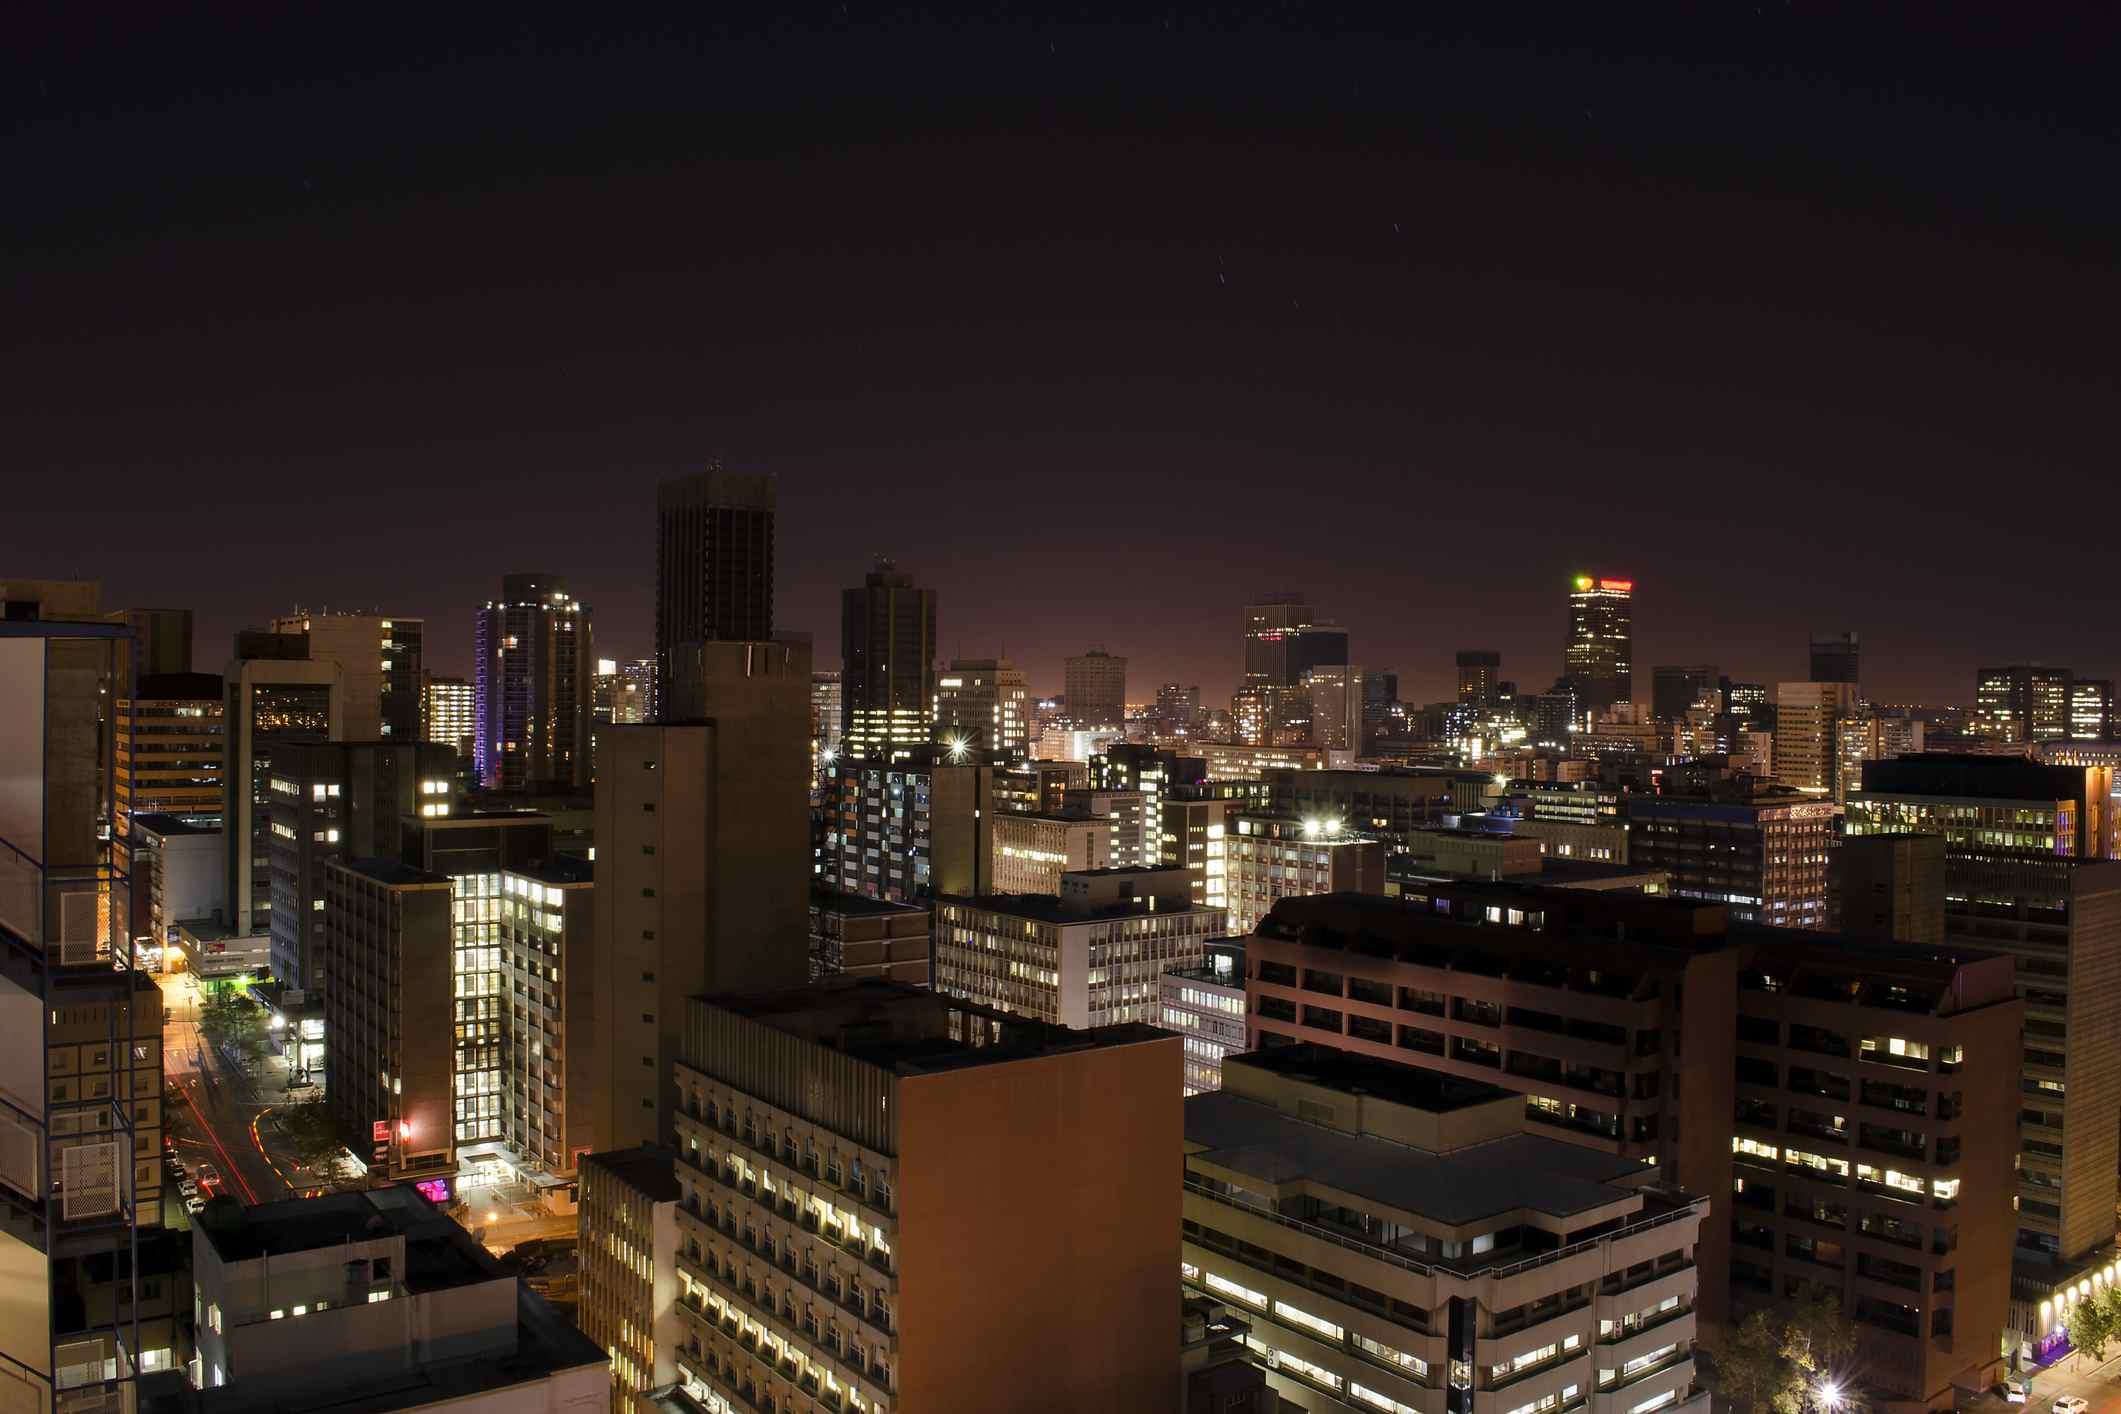 A wide angle night shot of Braamfontein and the surrounding cityscape of downtown Johannesburg CBD, Johannesburg, Gauteng, South Africa.